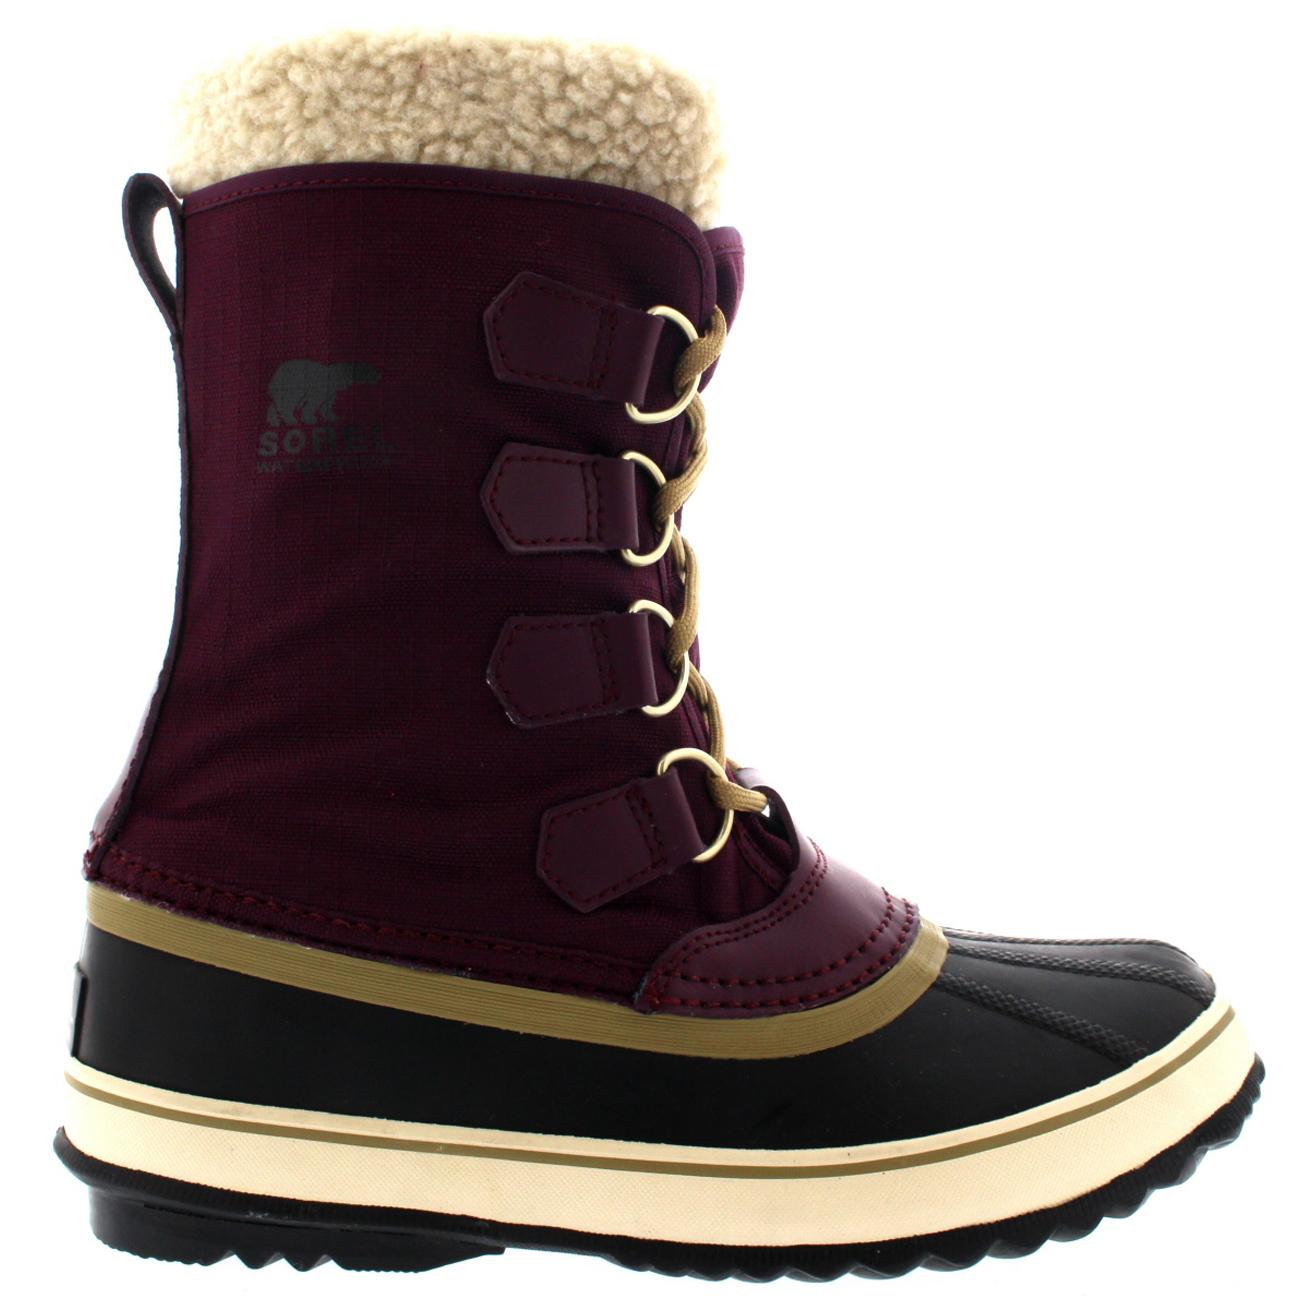 Ladies Sorel Winter Carnival Duck Snow Warm Walking Hiking Winter Boot All Sizes